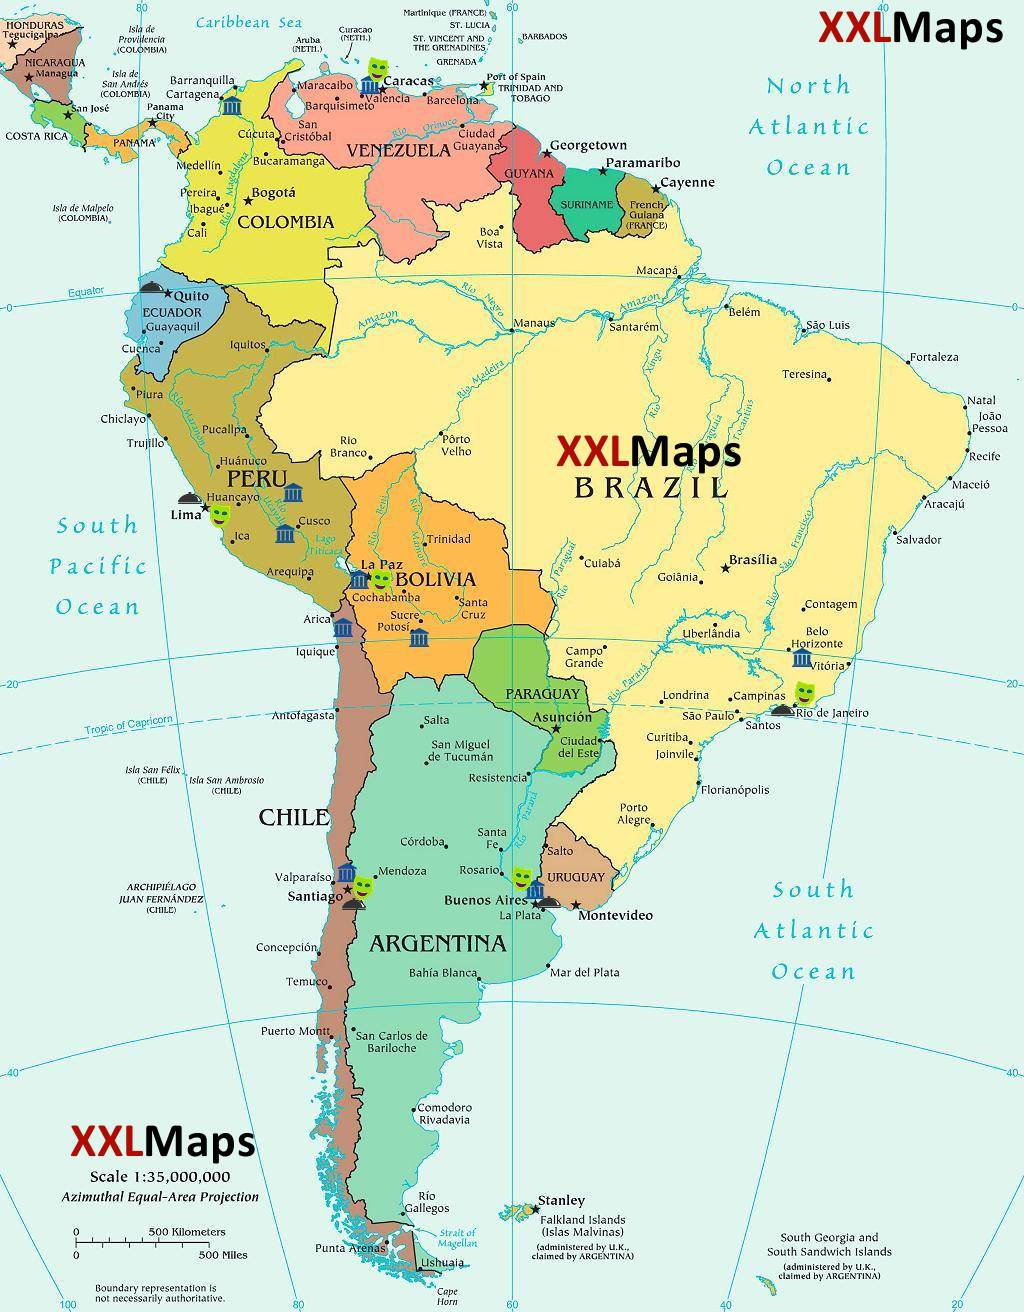 Politicka Mapa Jizni Amerika Zdarma Ke Stazeni Pro Smartphony